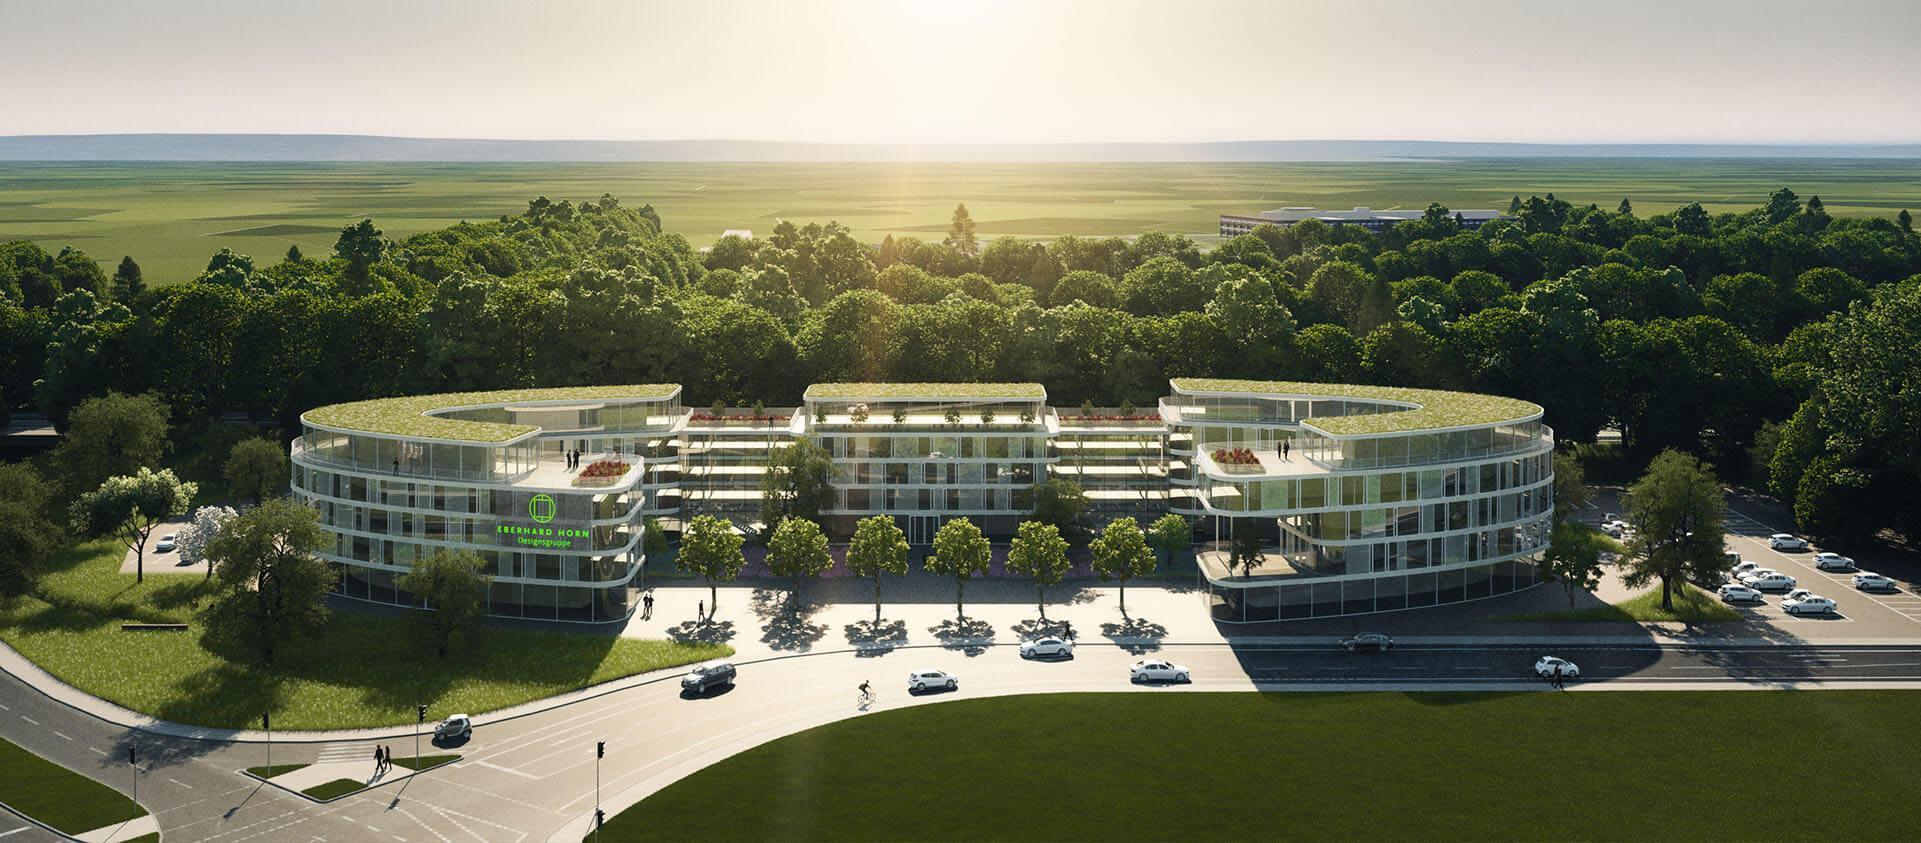 Projektentwicklung Bad Homburg Eberhard Horn Designgruppe, Gebäudekomplex Natural Balance Campus